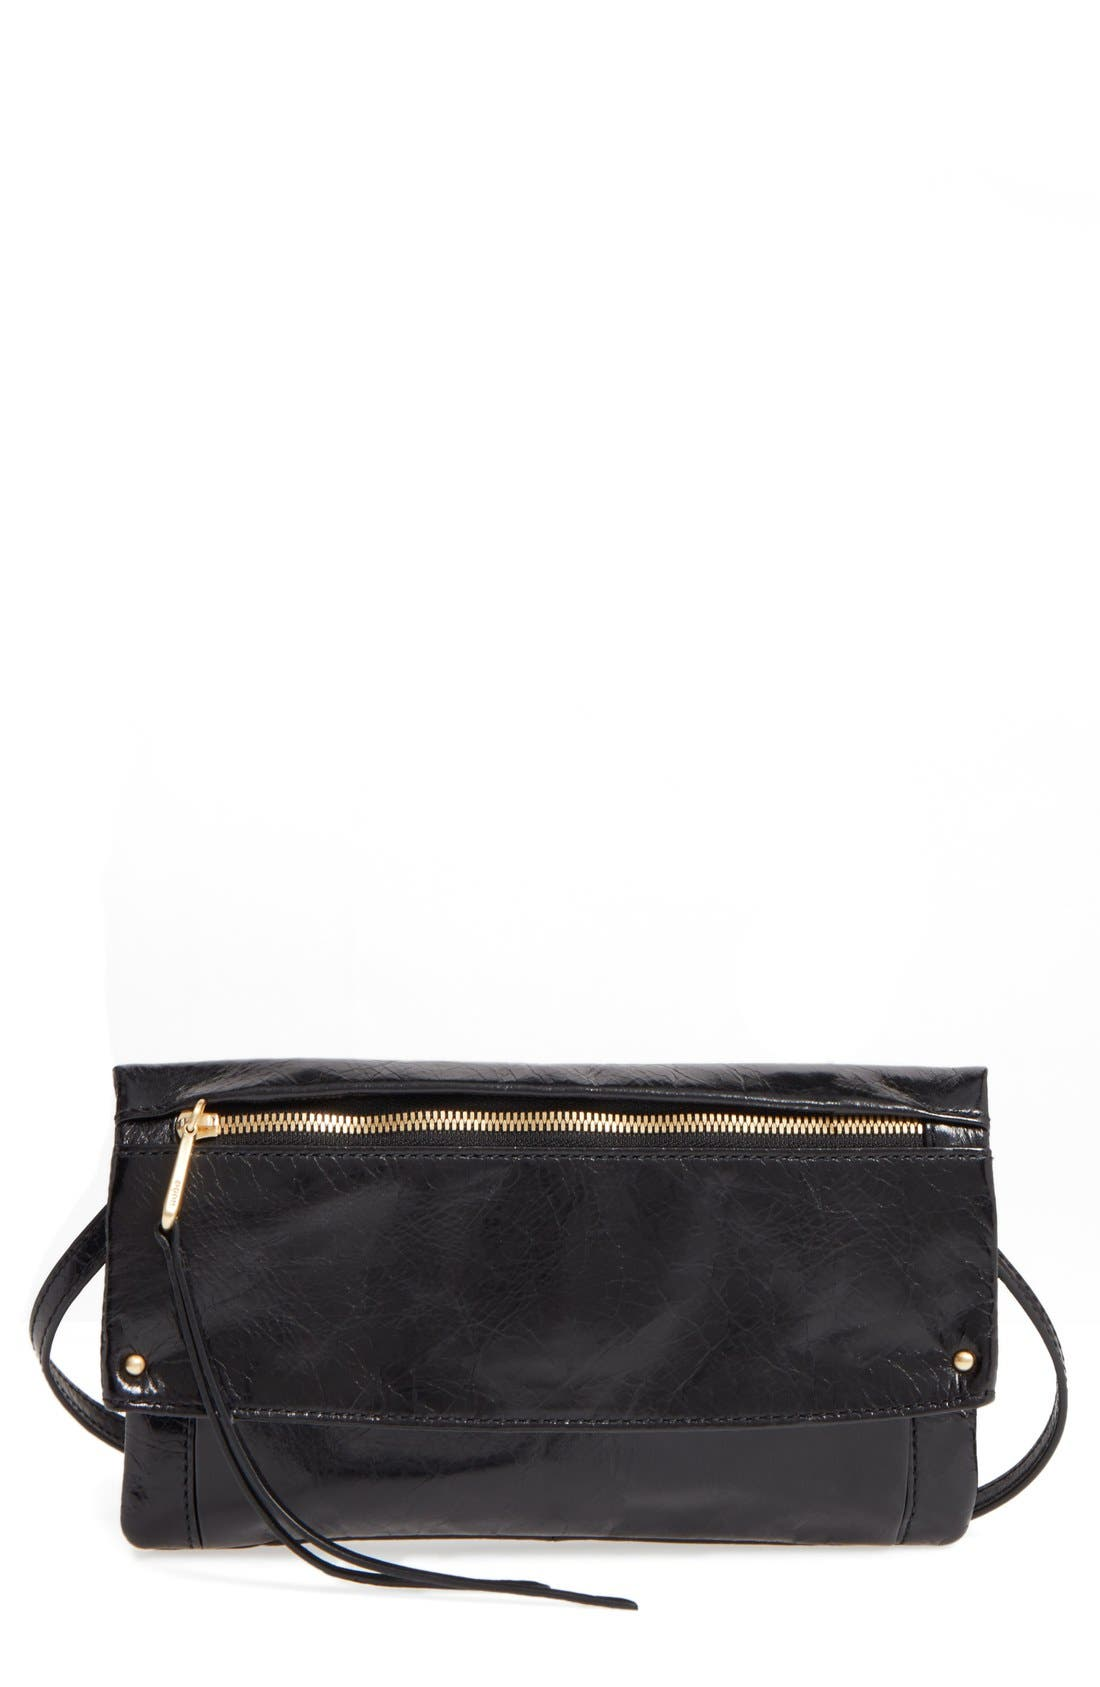 Rudy Leather Crossbody Bag,                             Main thumbnail 1, color,                             001